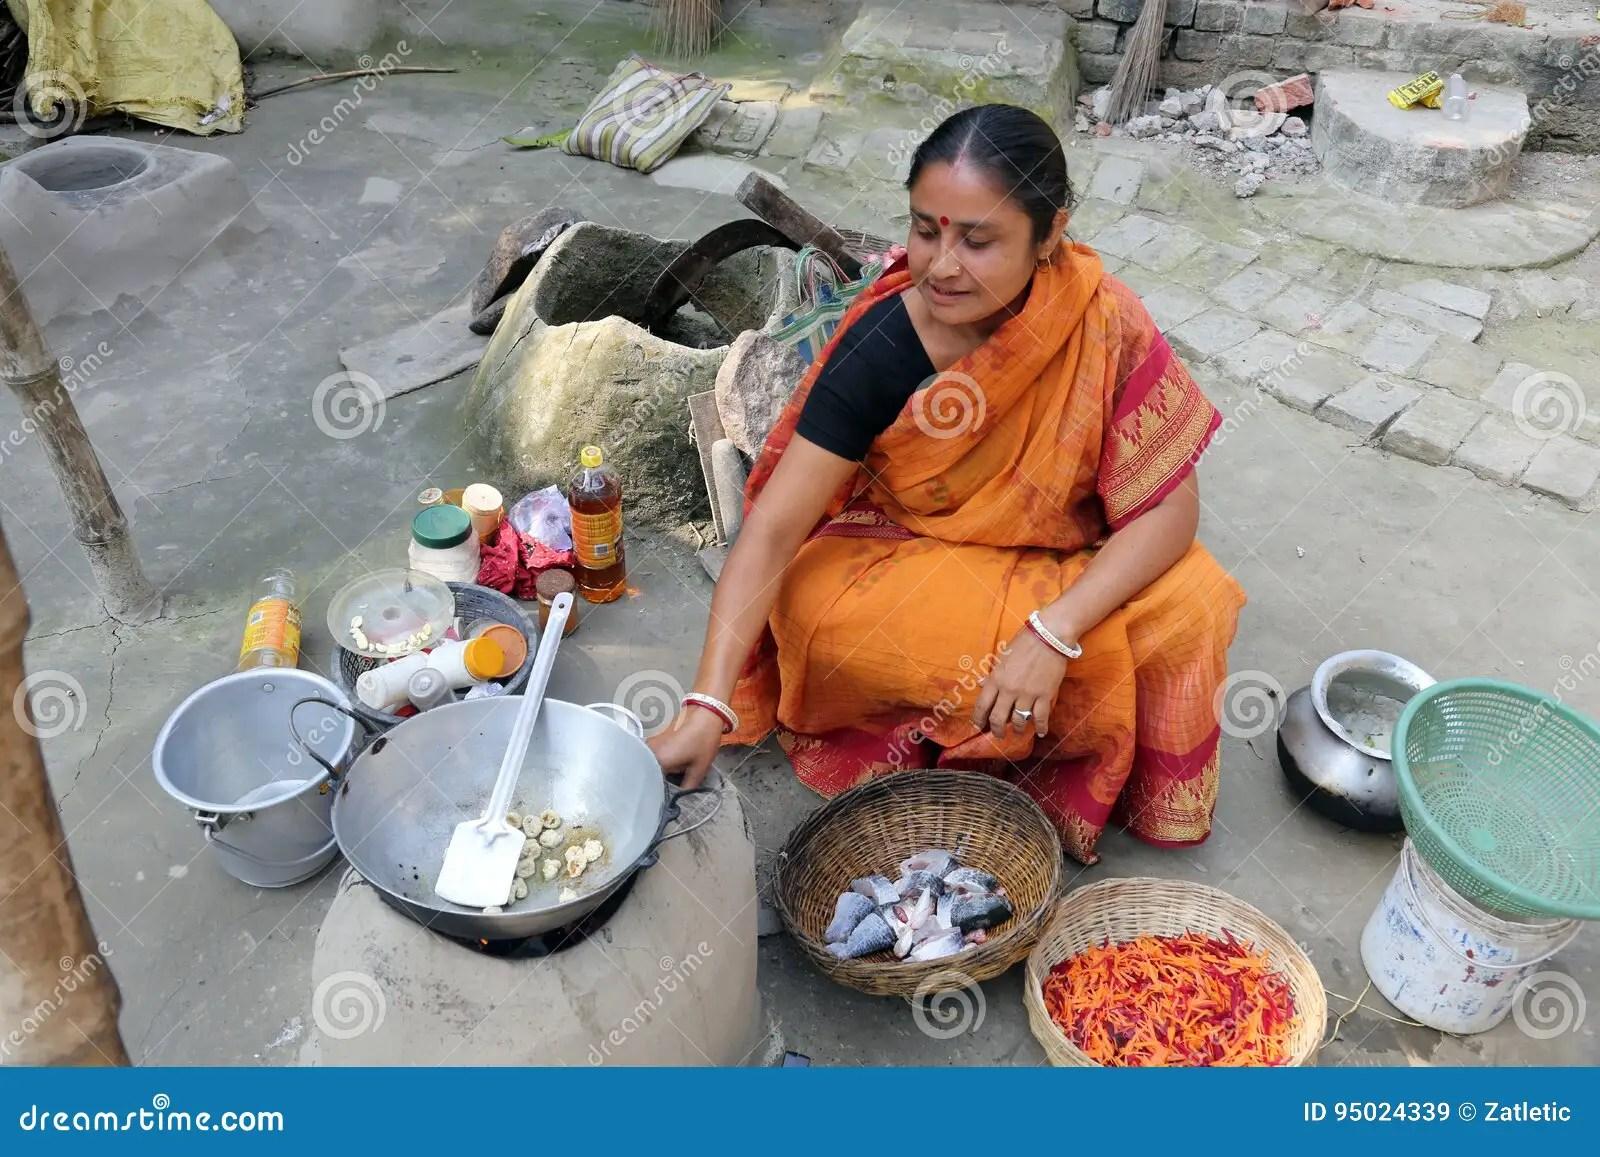 kitchens of india kitchen aid slide in range 做食物传统方式在老厨房在村庄 kumrokhali 印度里开火编辑类库存图片 印度里开火